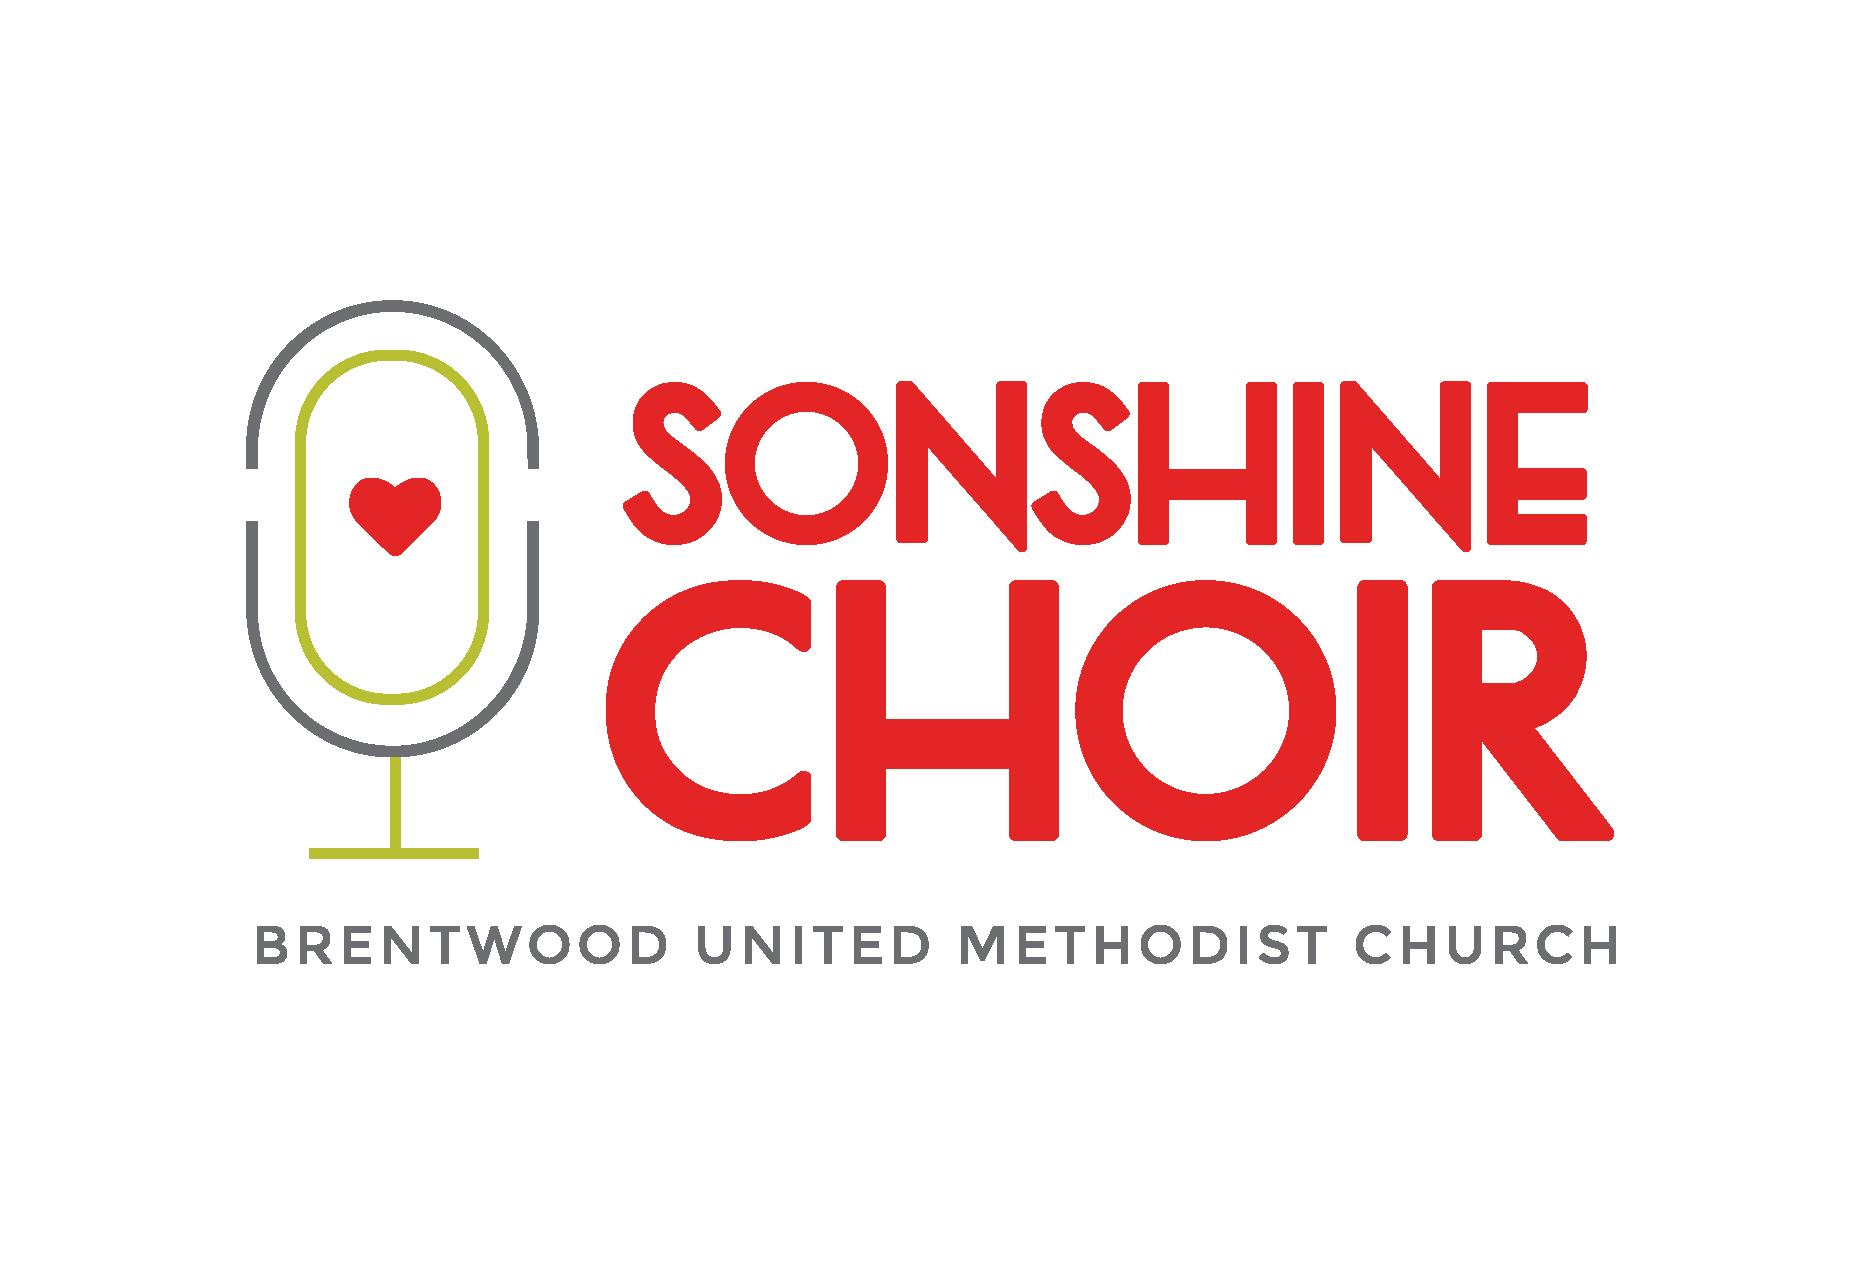 BUMC Sonshine Choir logo (1)